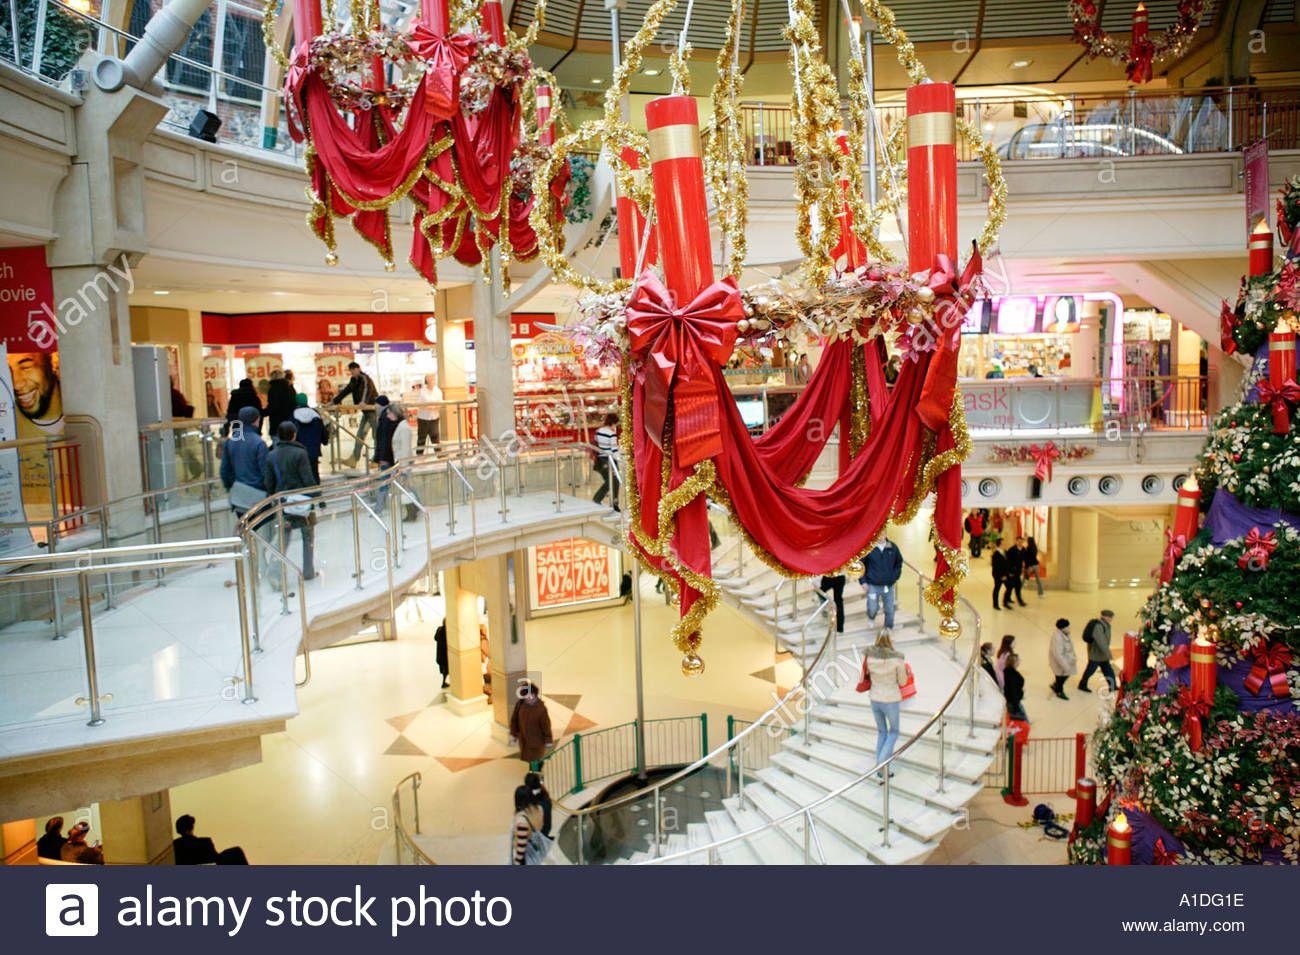 Christmas Decorations Shopping Mall Uk Stock Photo Navidad Nomenclatura